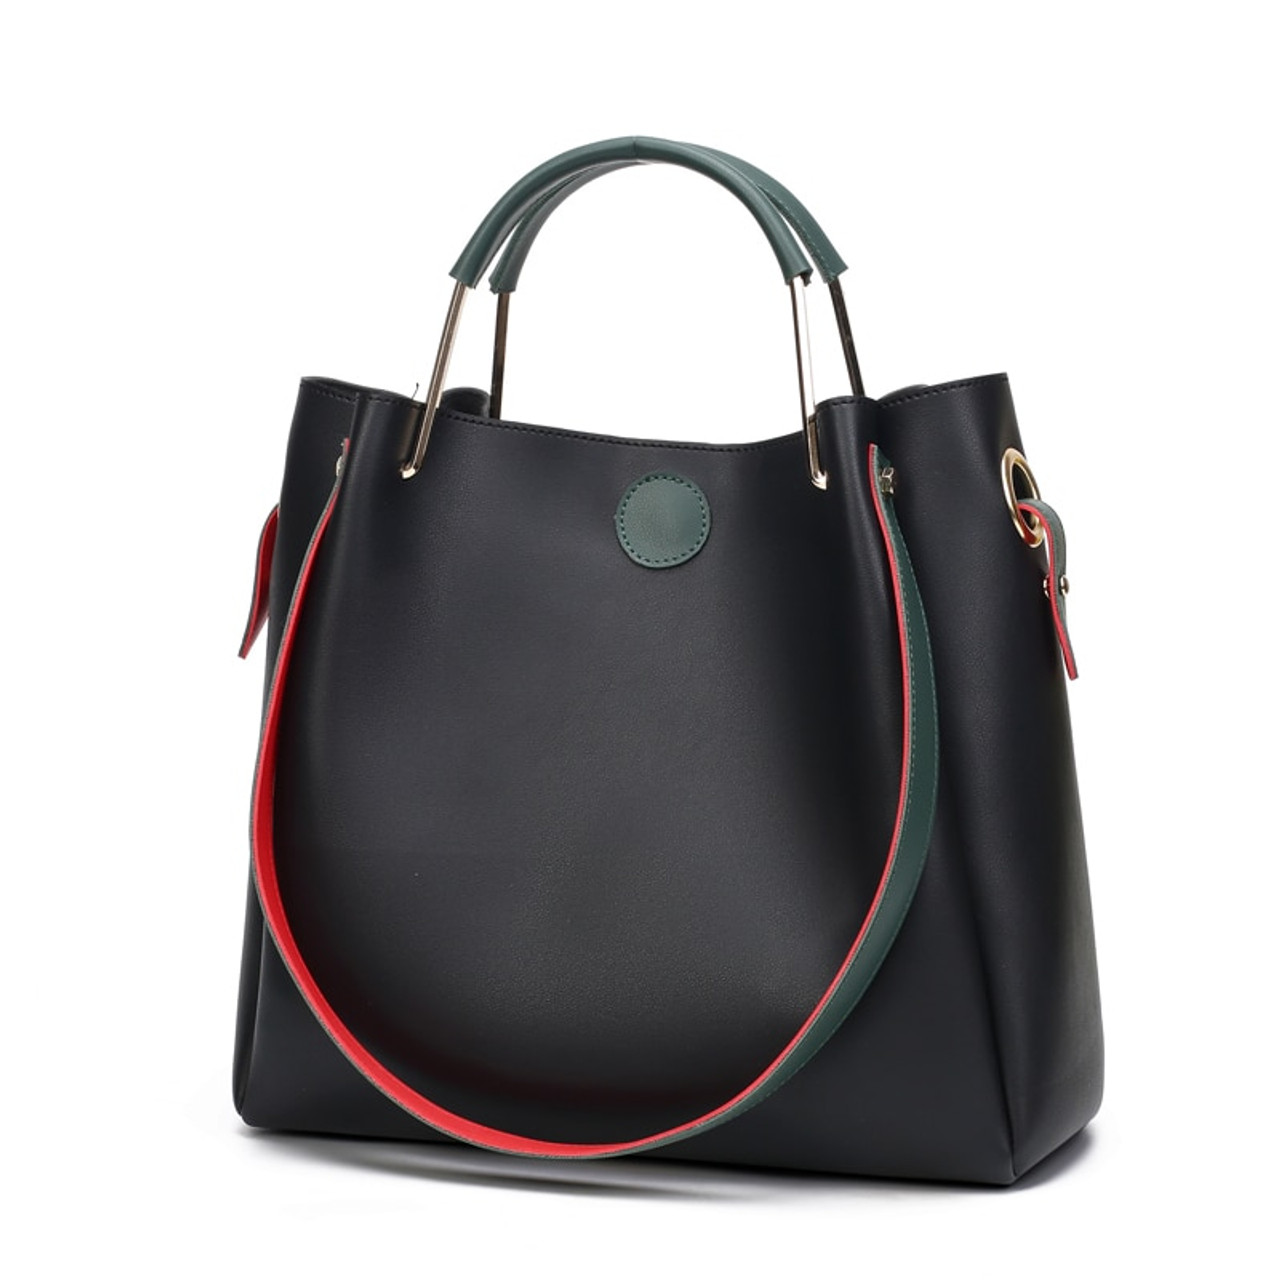 cf2de73b5da4 Fashion High Quality Women Handbags Fashion Women Shoulder Bag Female  Messenger Bag Large Crossbody Tote Bags 2019 Handbags